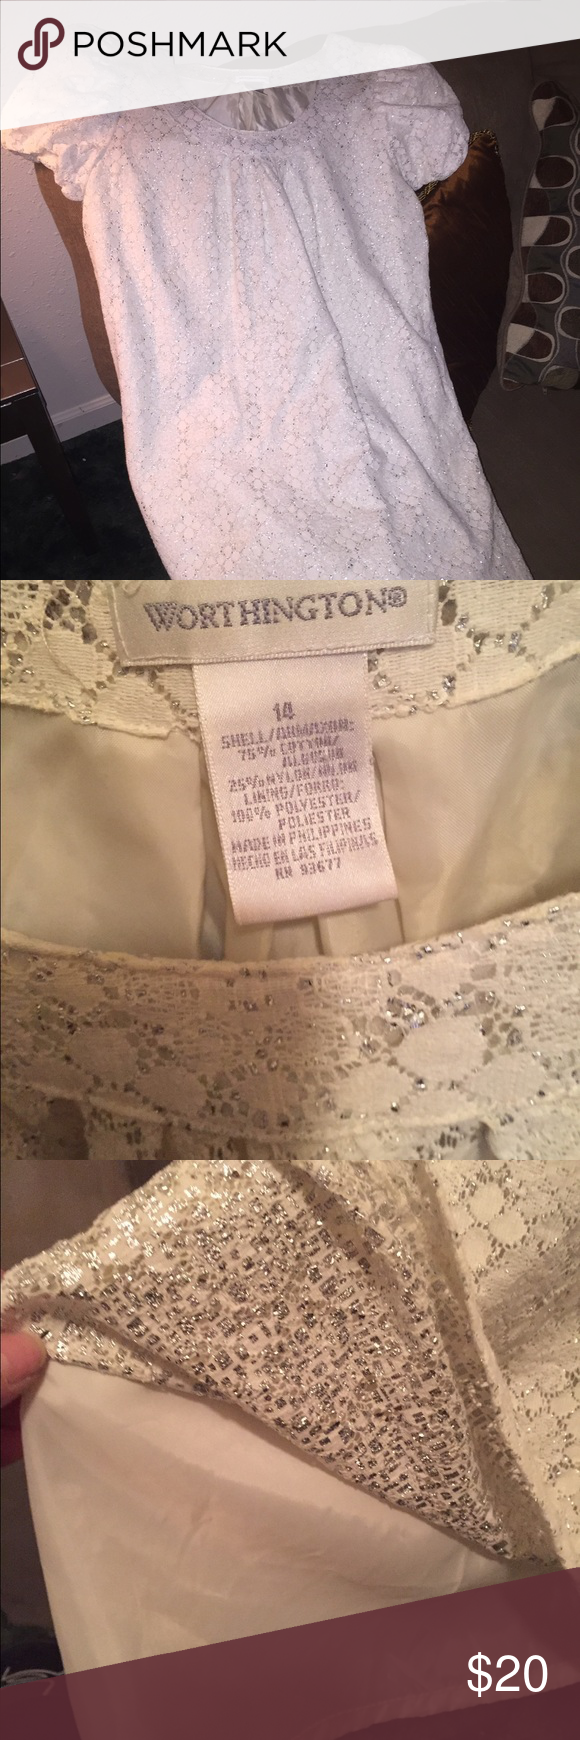 Wedding dress donation  Donating soon Make offer White babydoll dress  Midi dresses